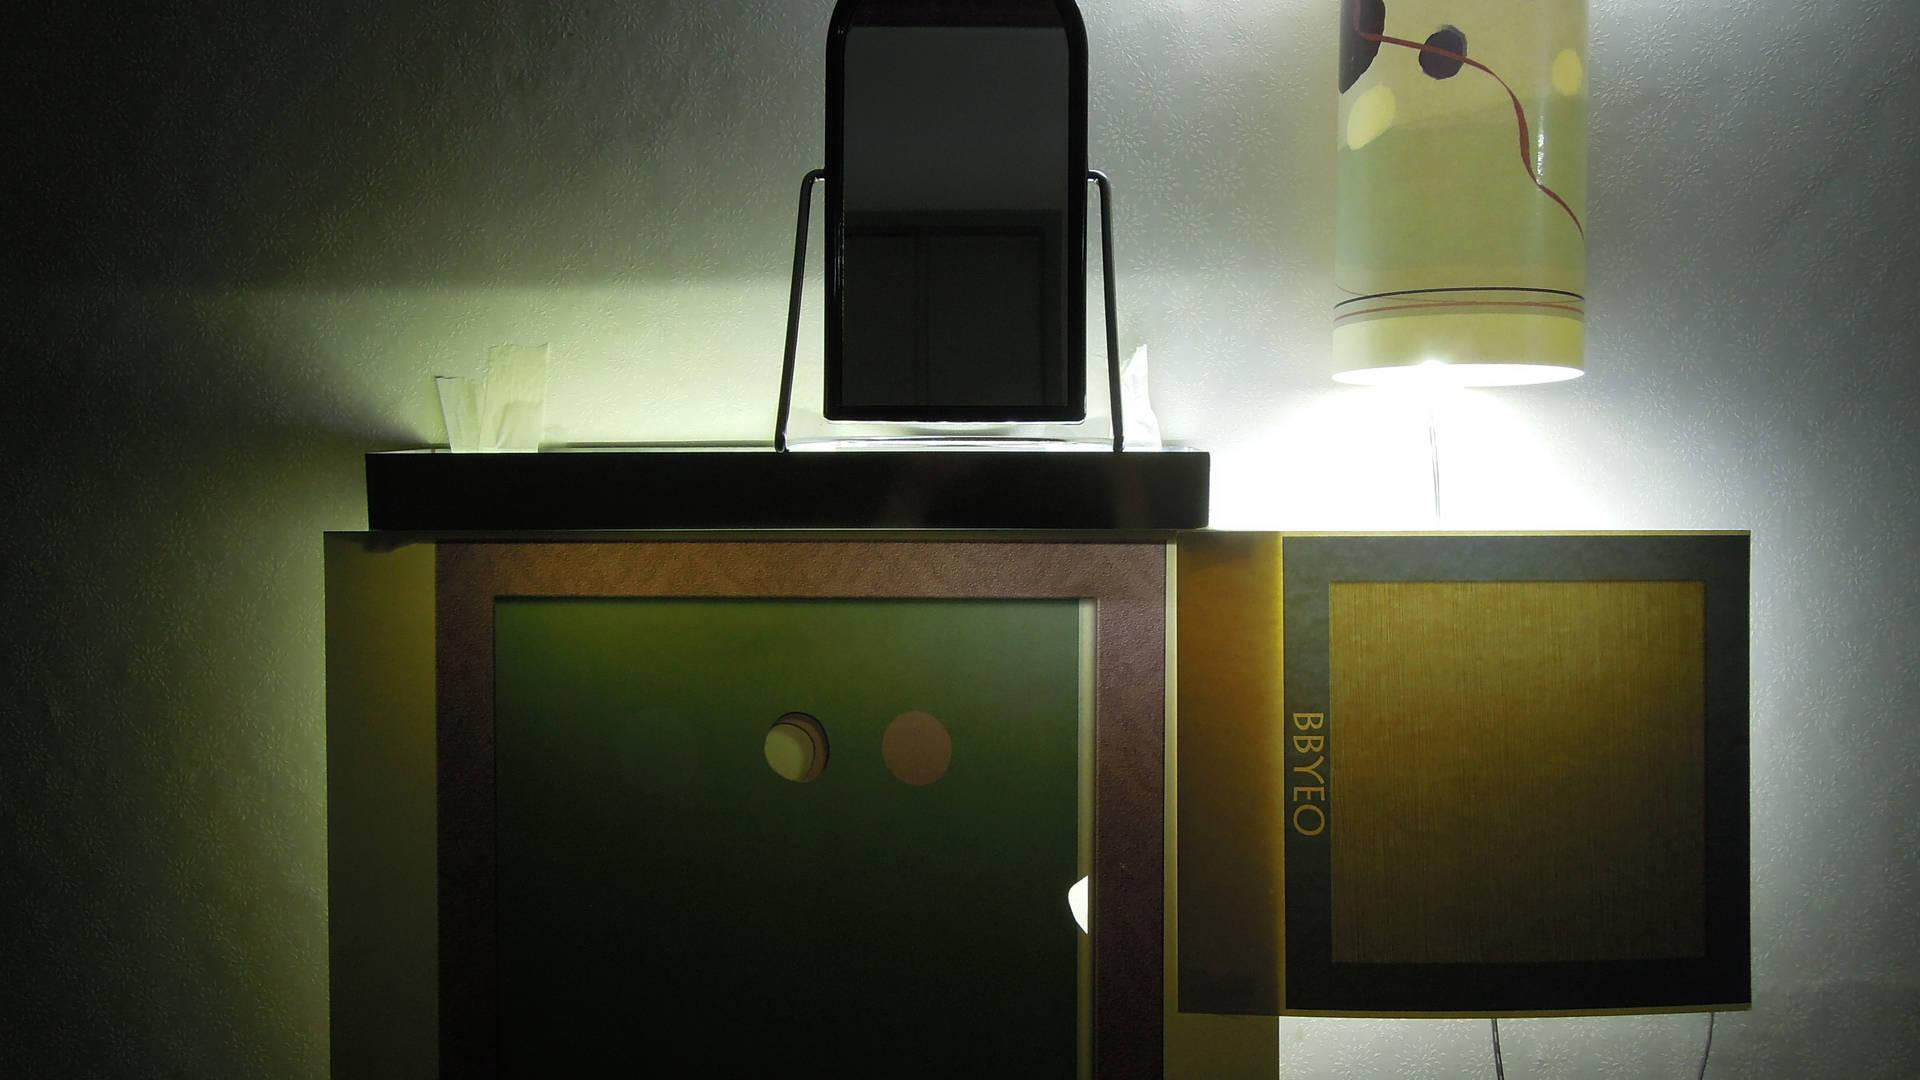 SET for lighting set (검정빛 시공)